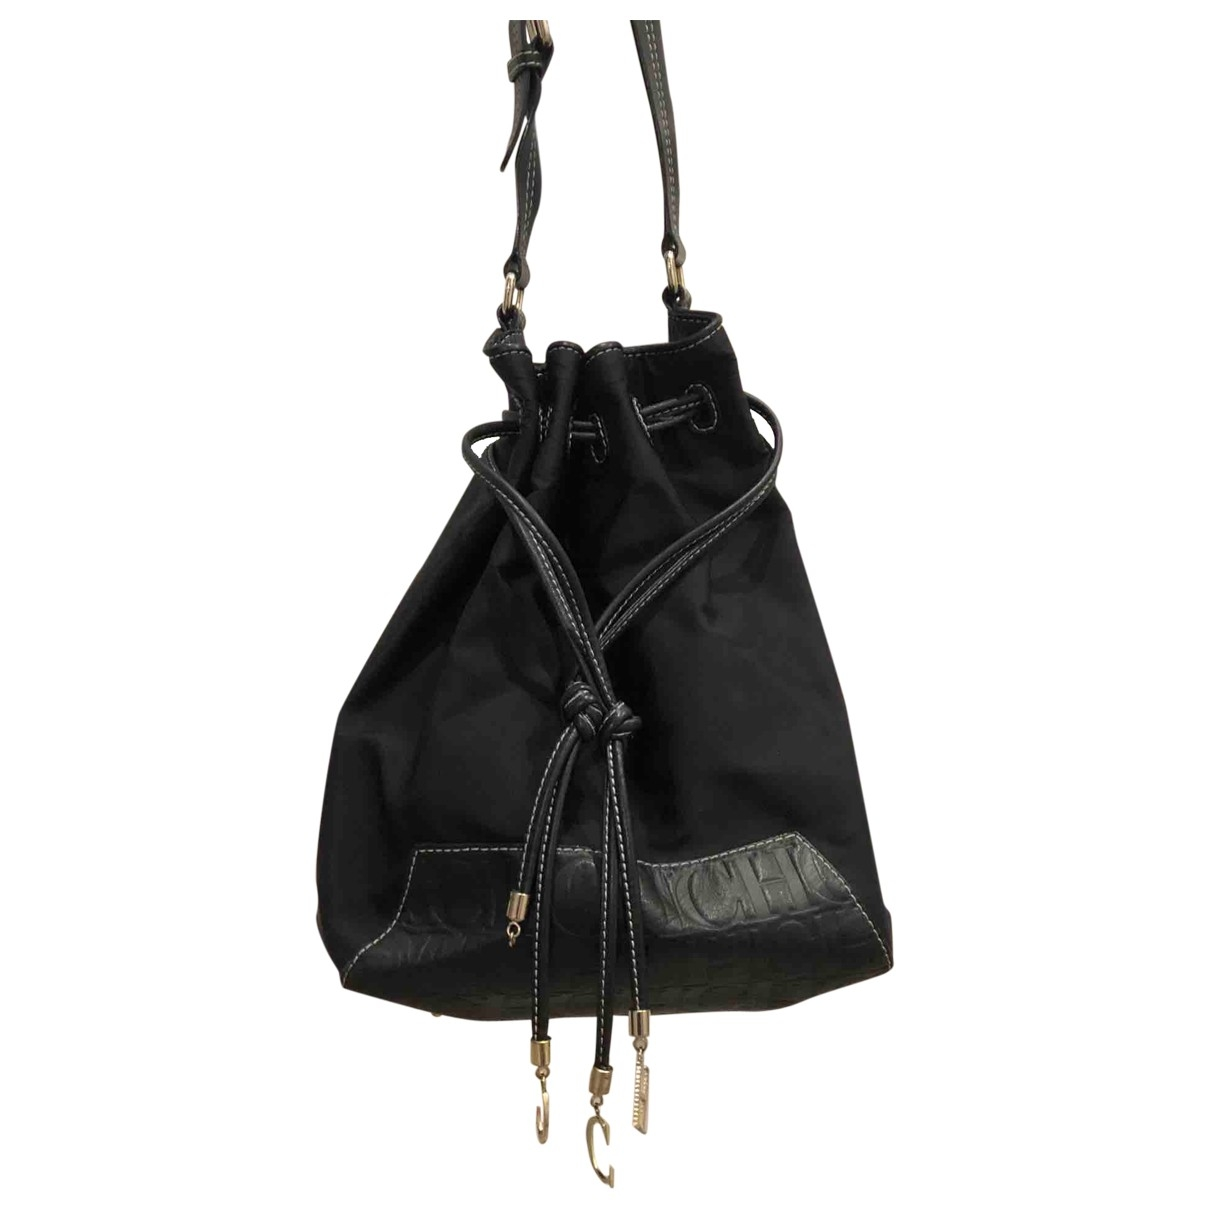 Carolina Herrera \N Handtasche in  Schwarz Leinen